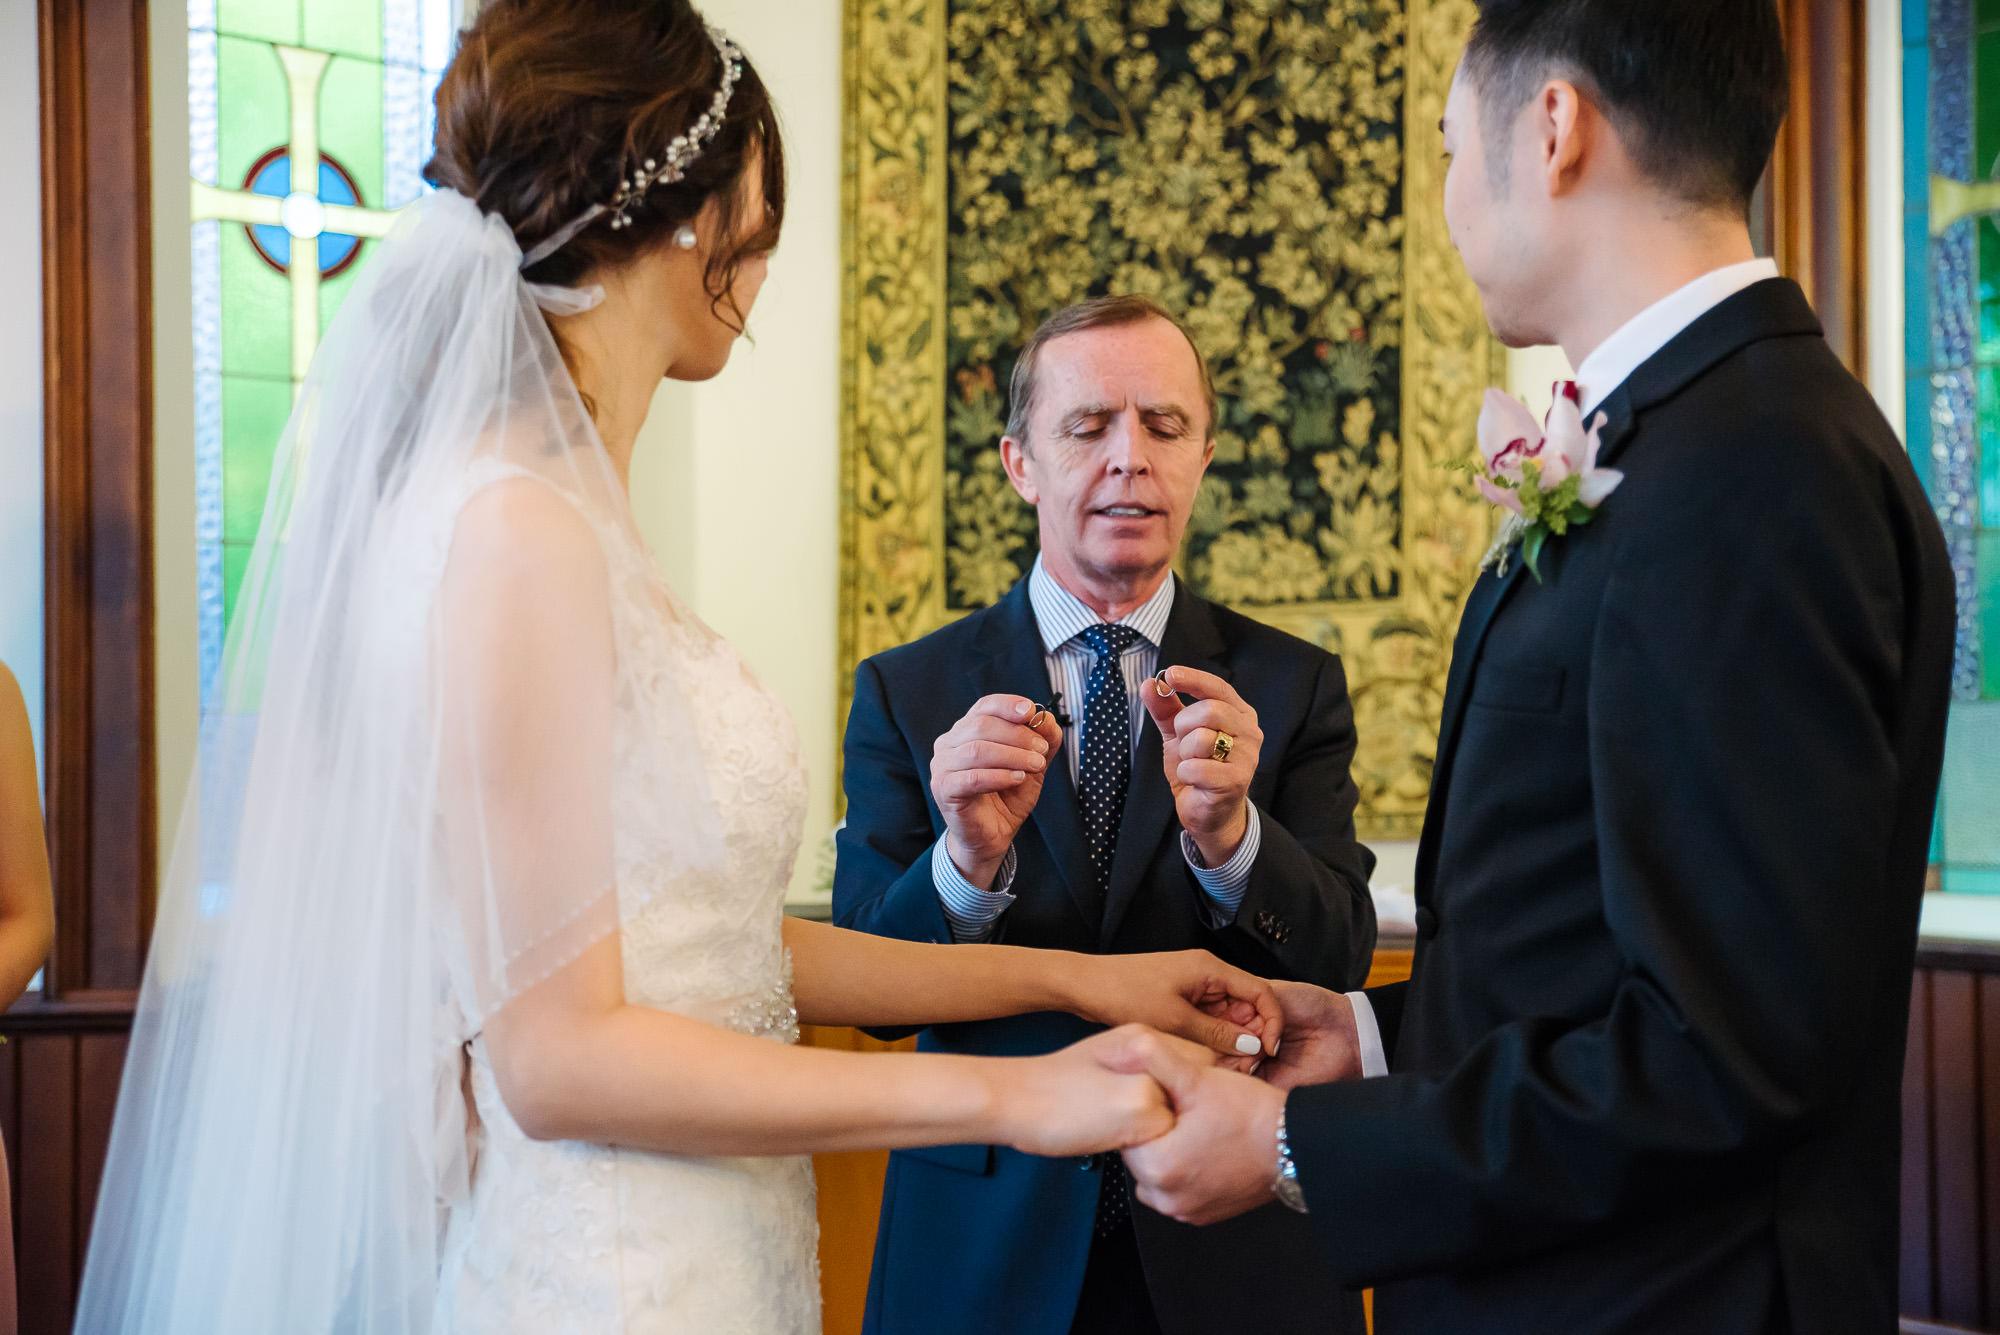 minoru_chapel_richmond_wedding_ceremony 1618357.jpg